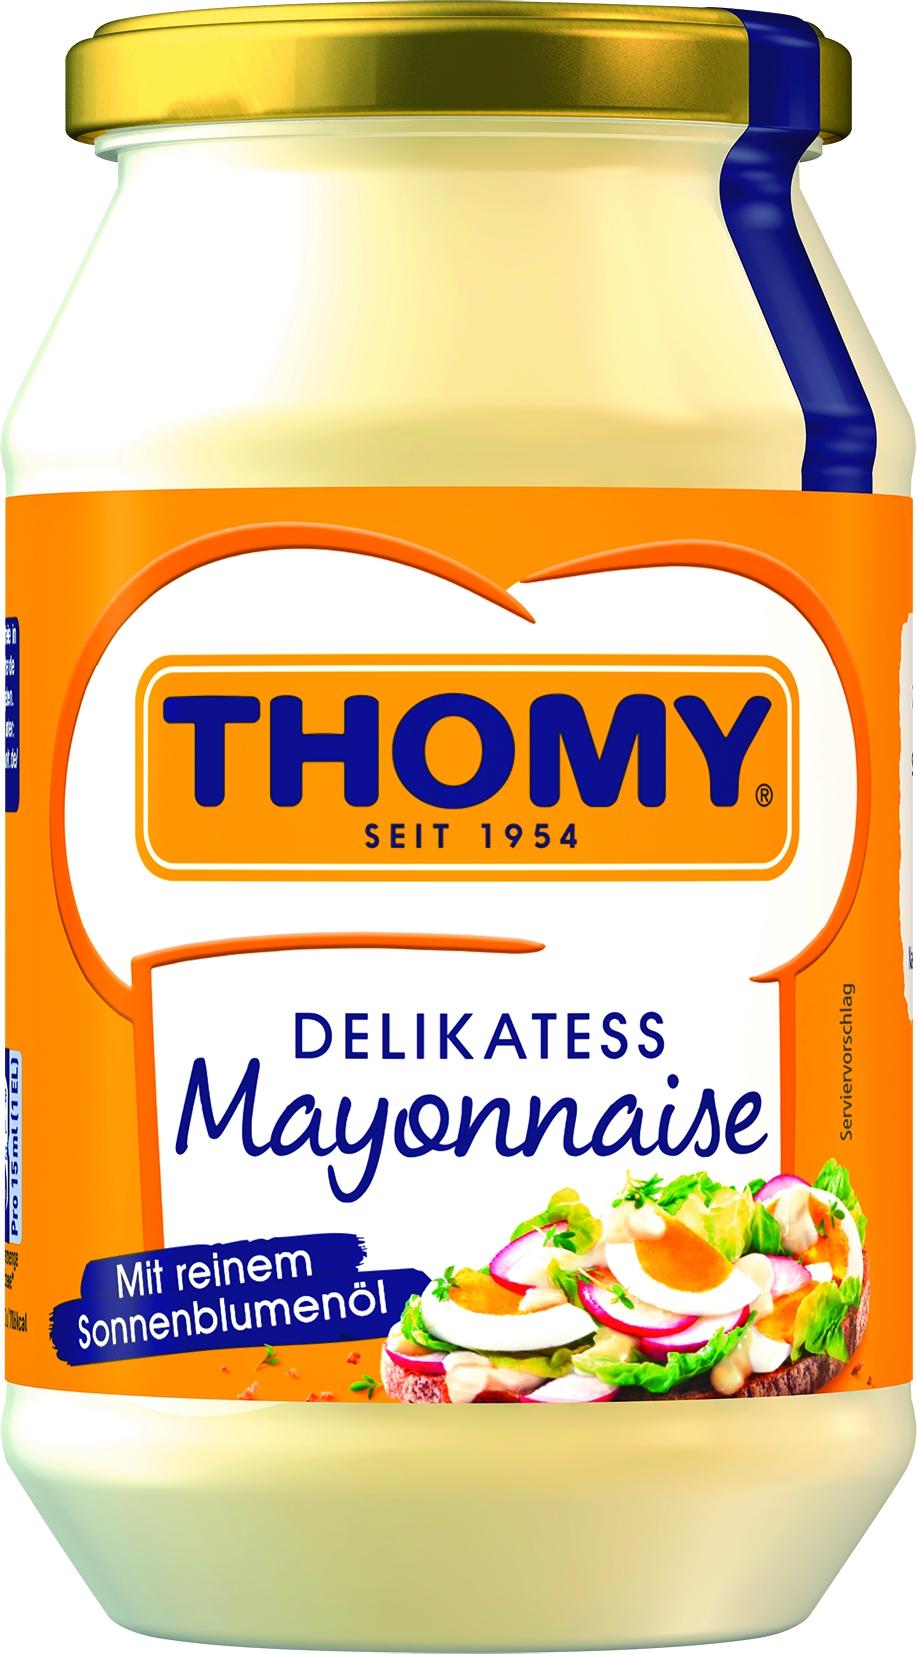 Delikatess Mayonaise